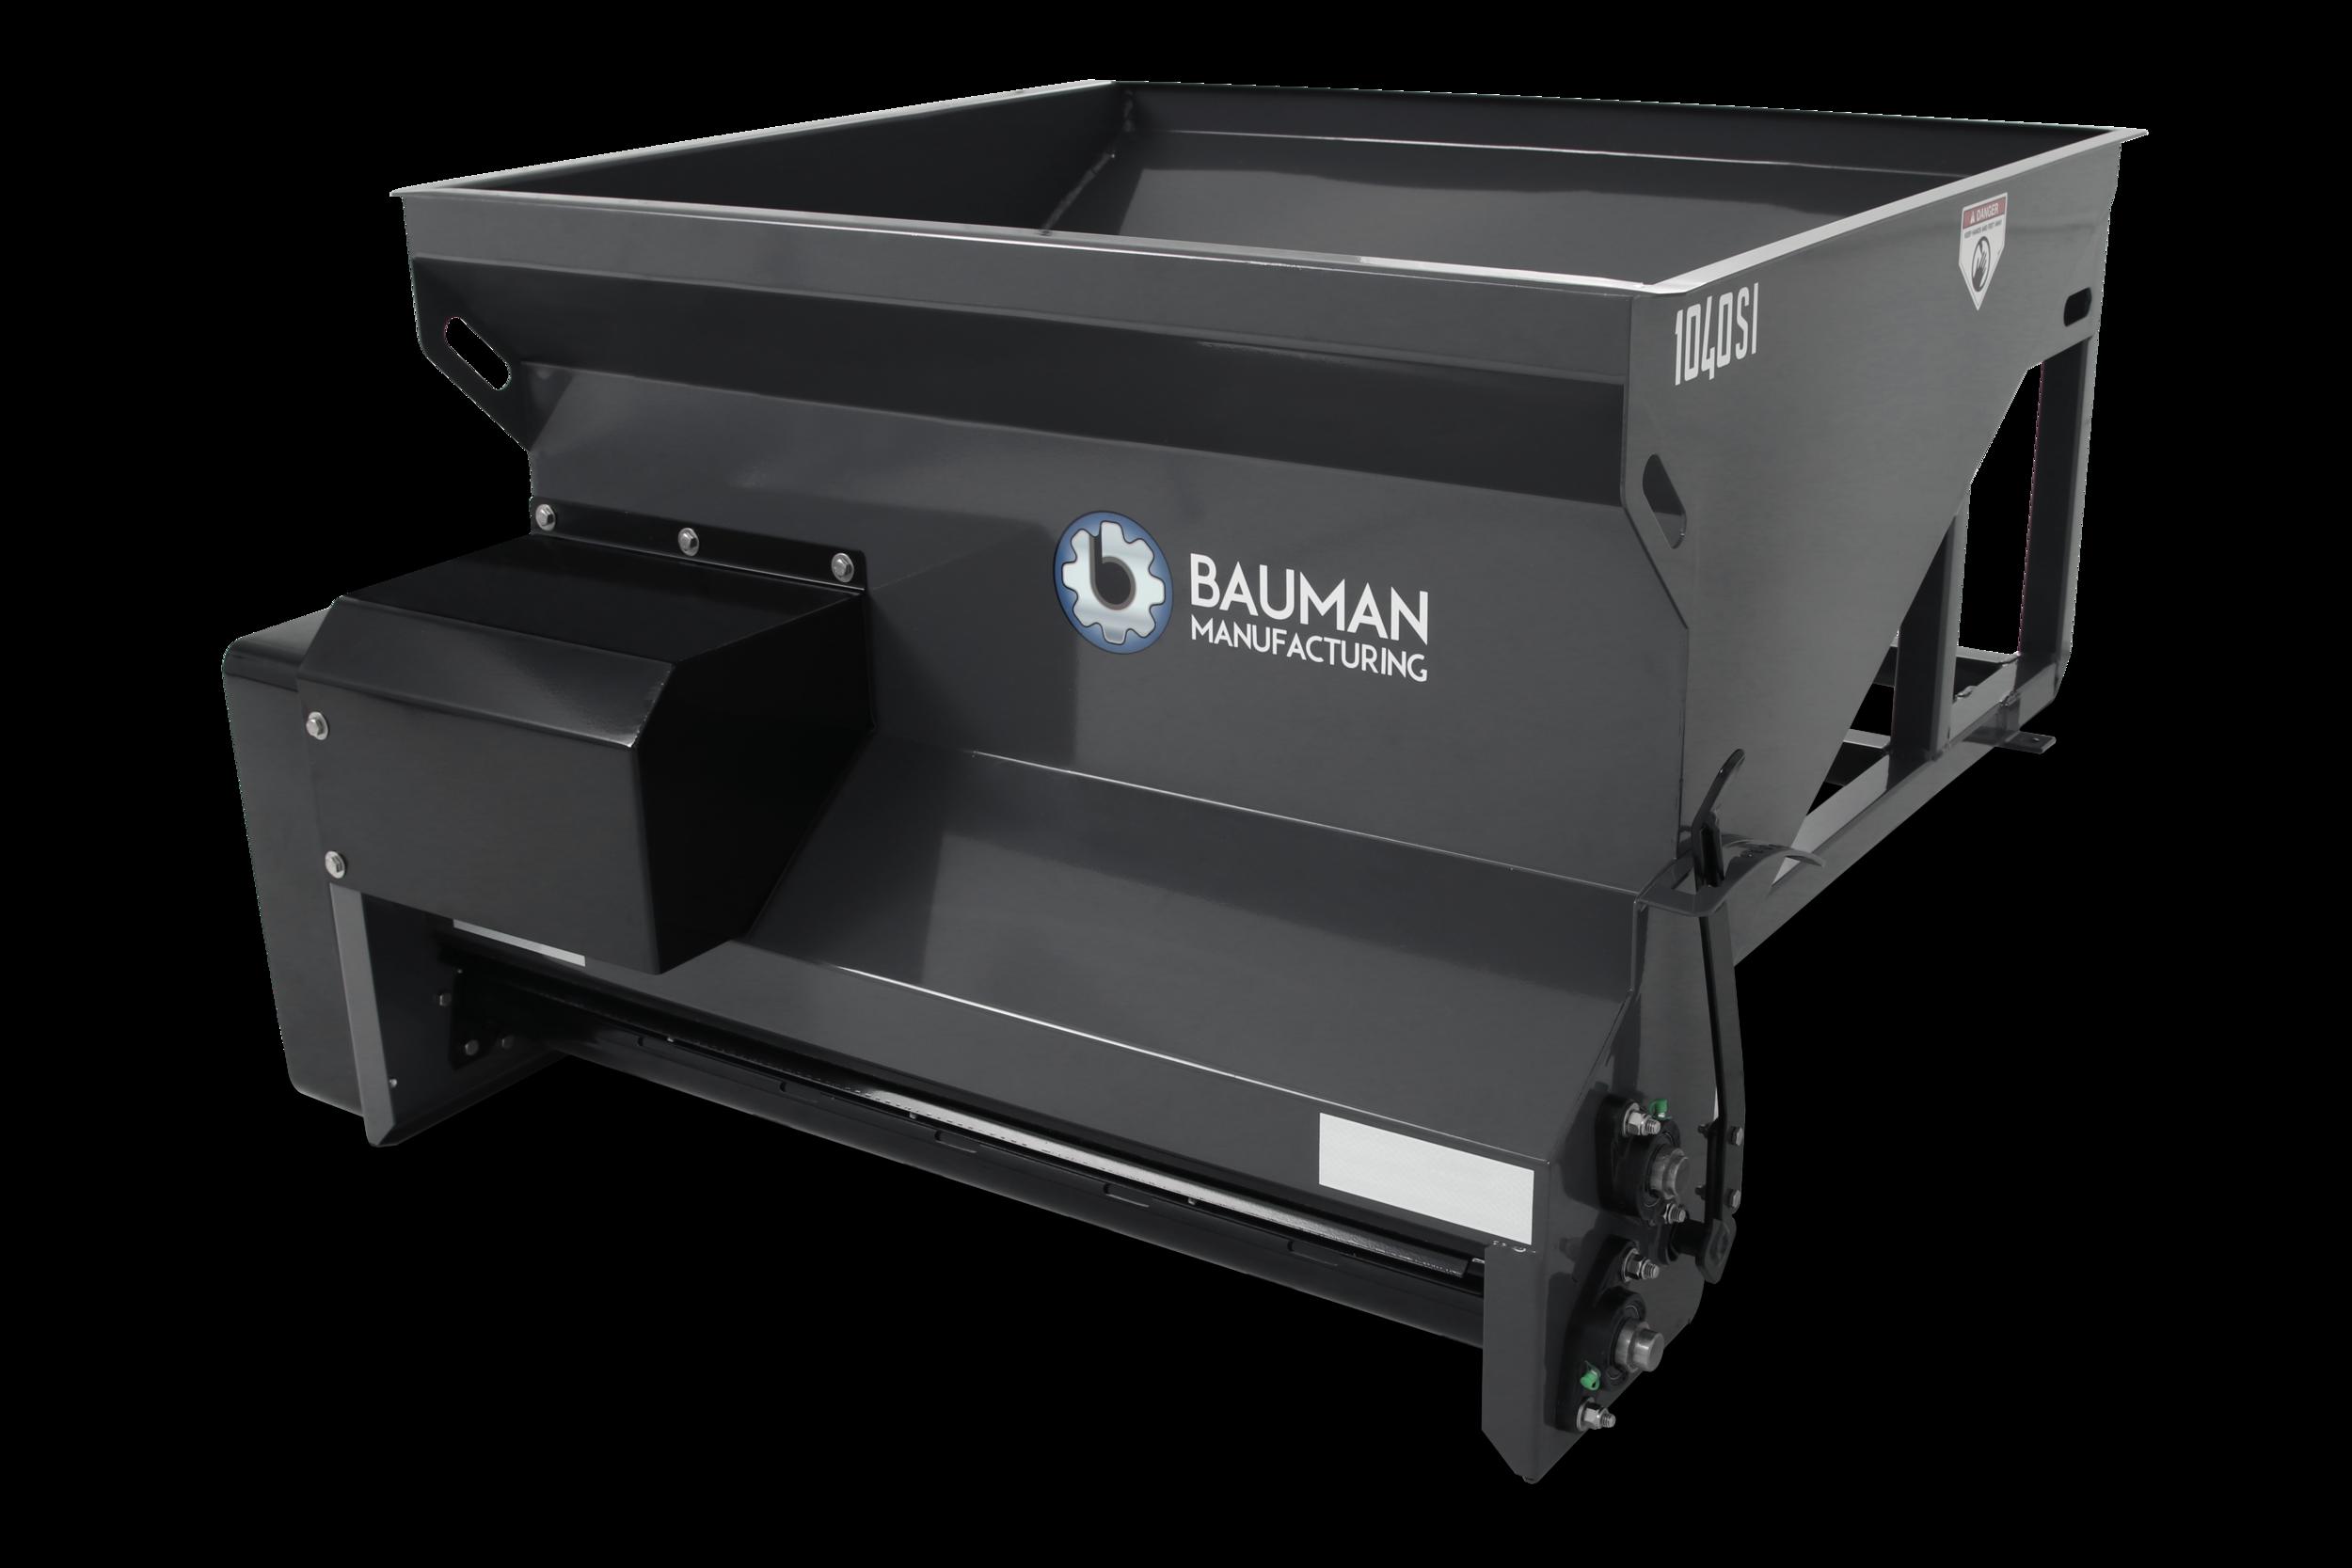 Bauman Drop Spreader Model 1040SI